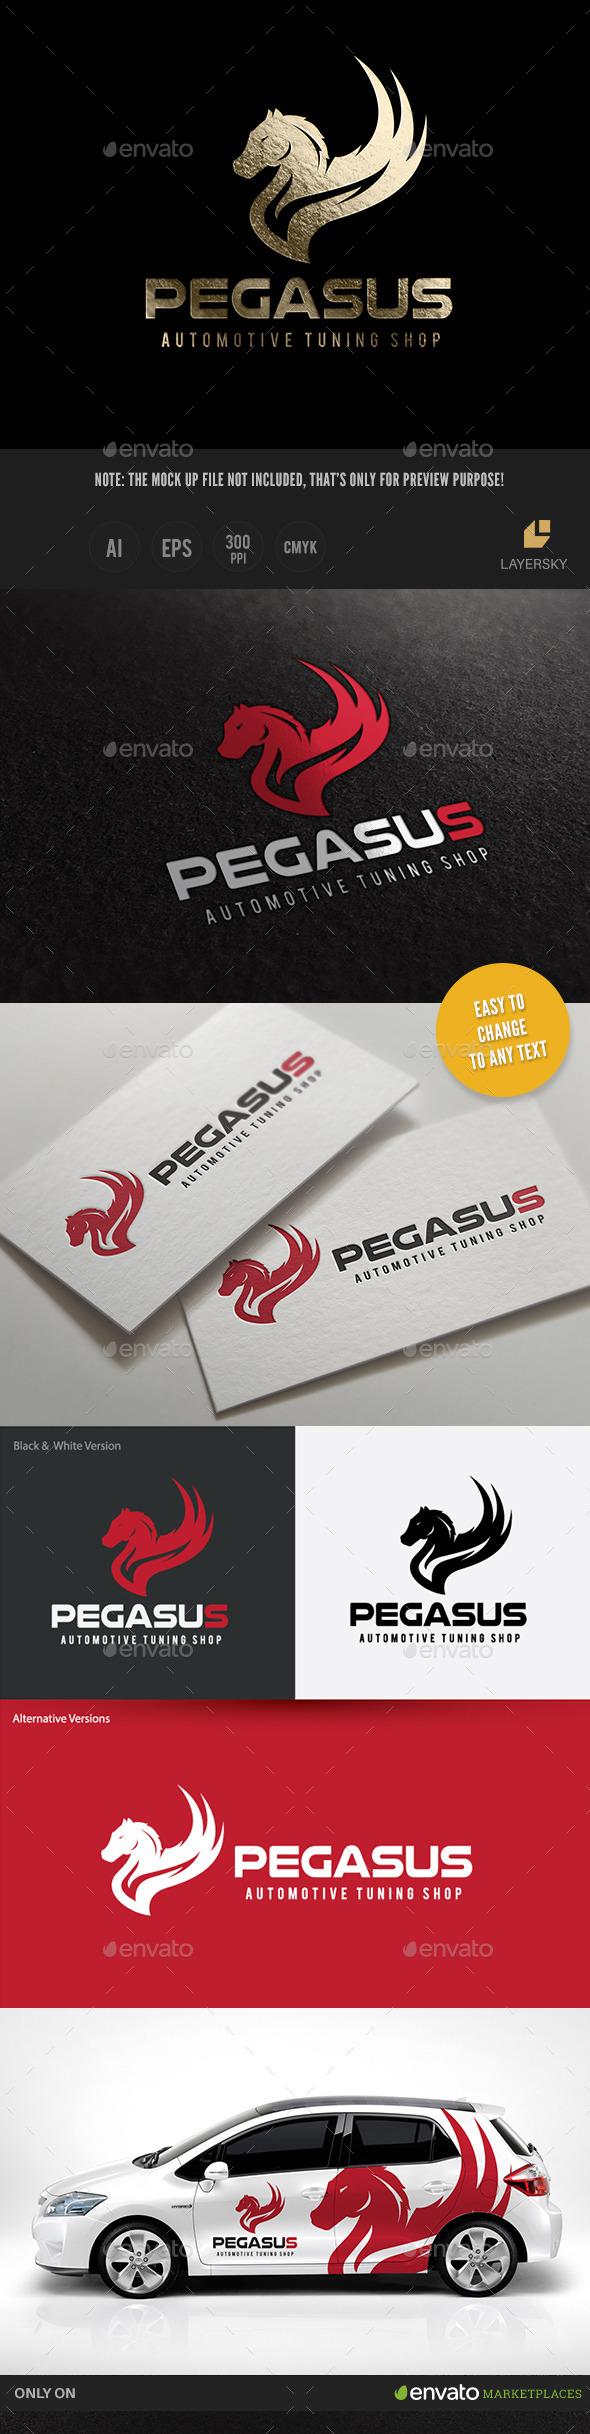 GraphicRiver Pegasus 11362699